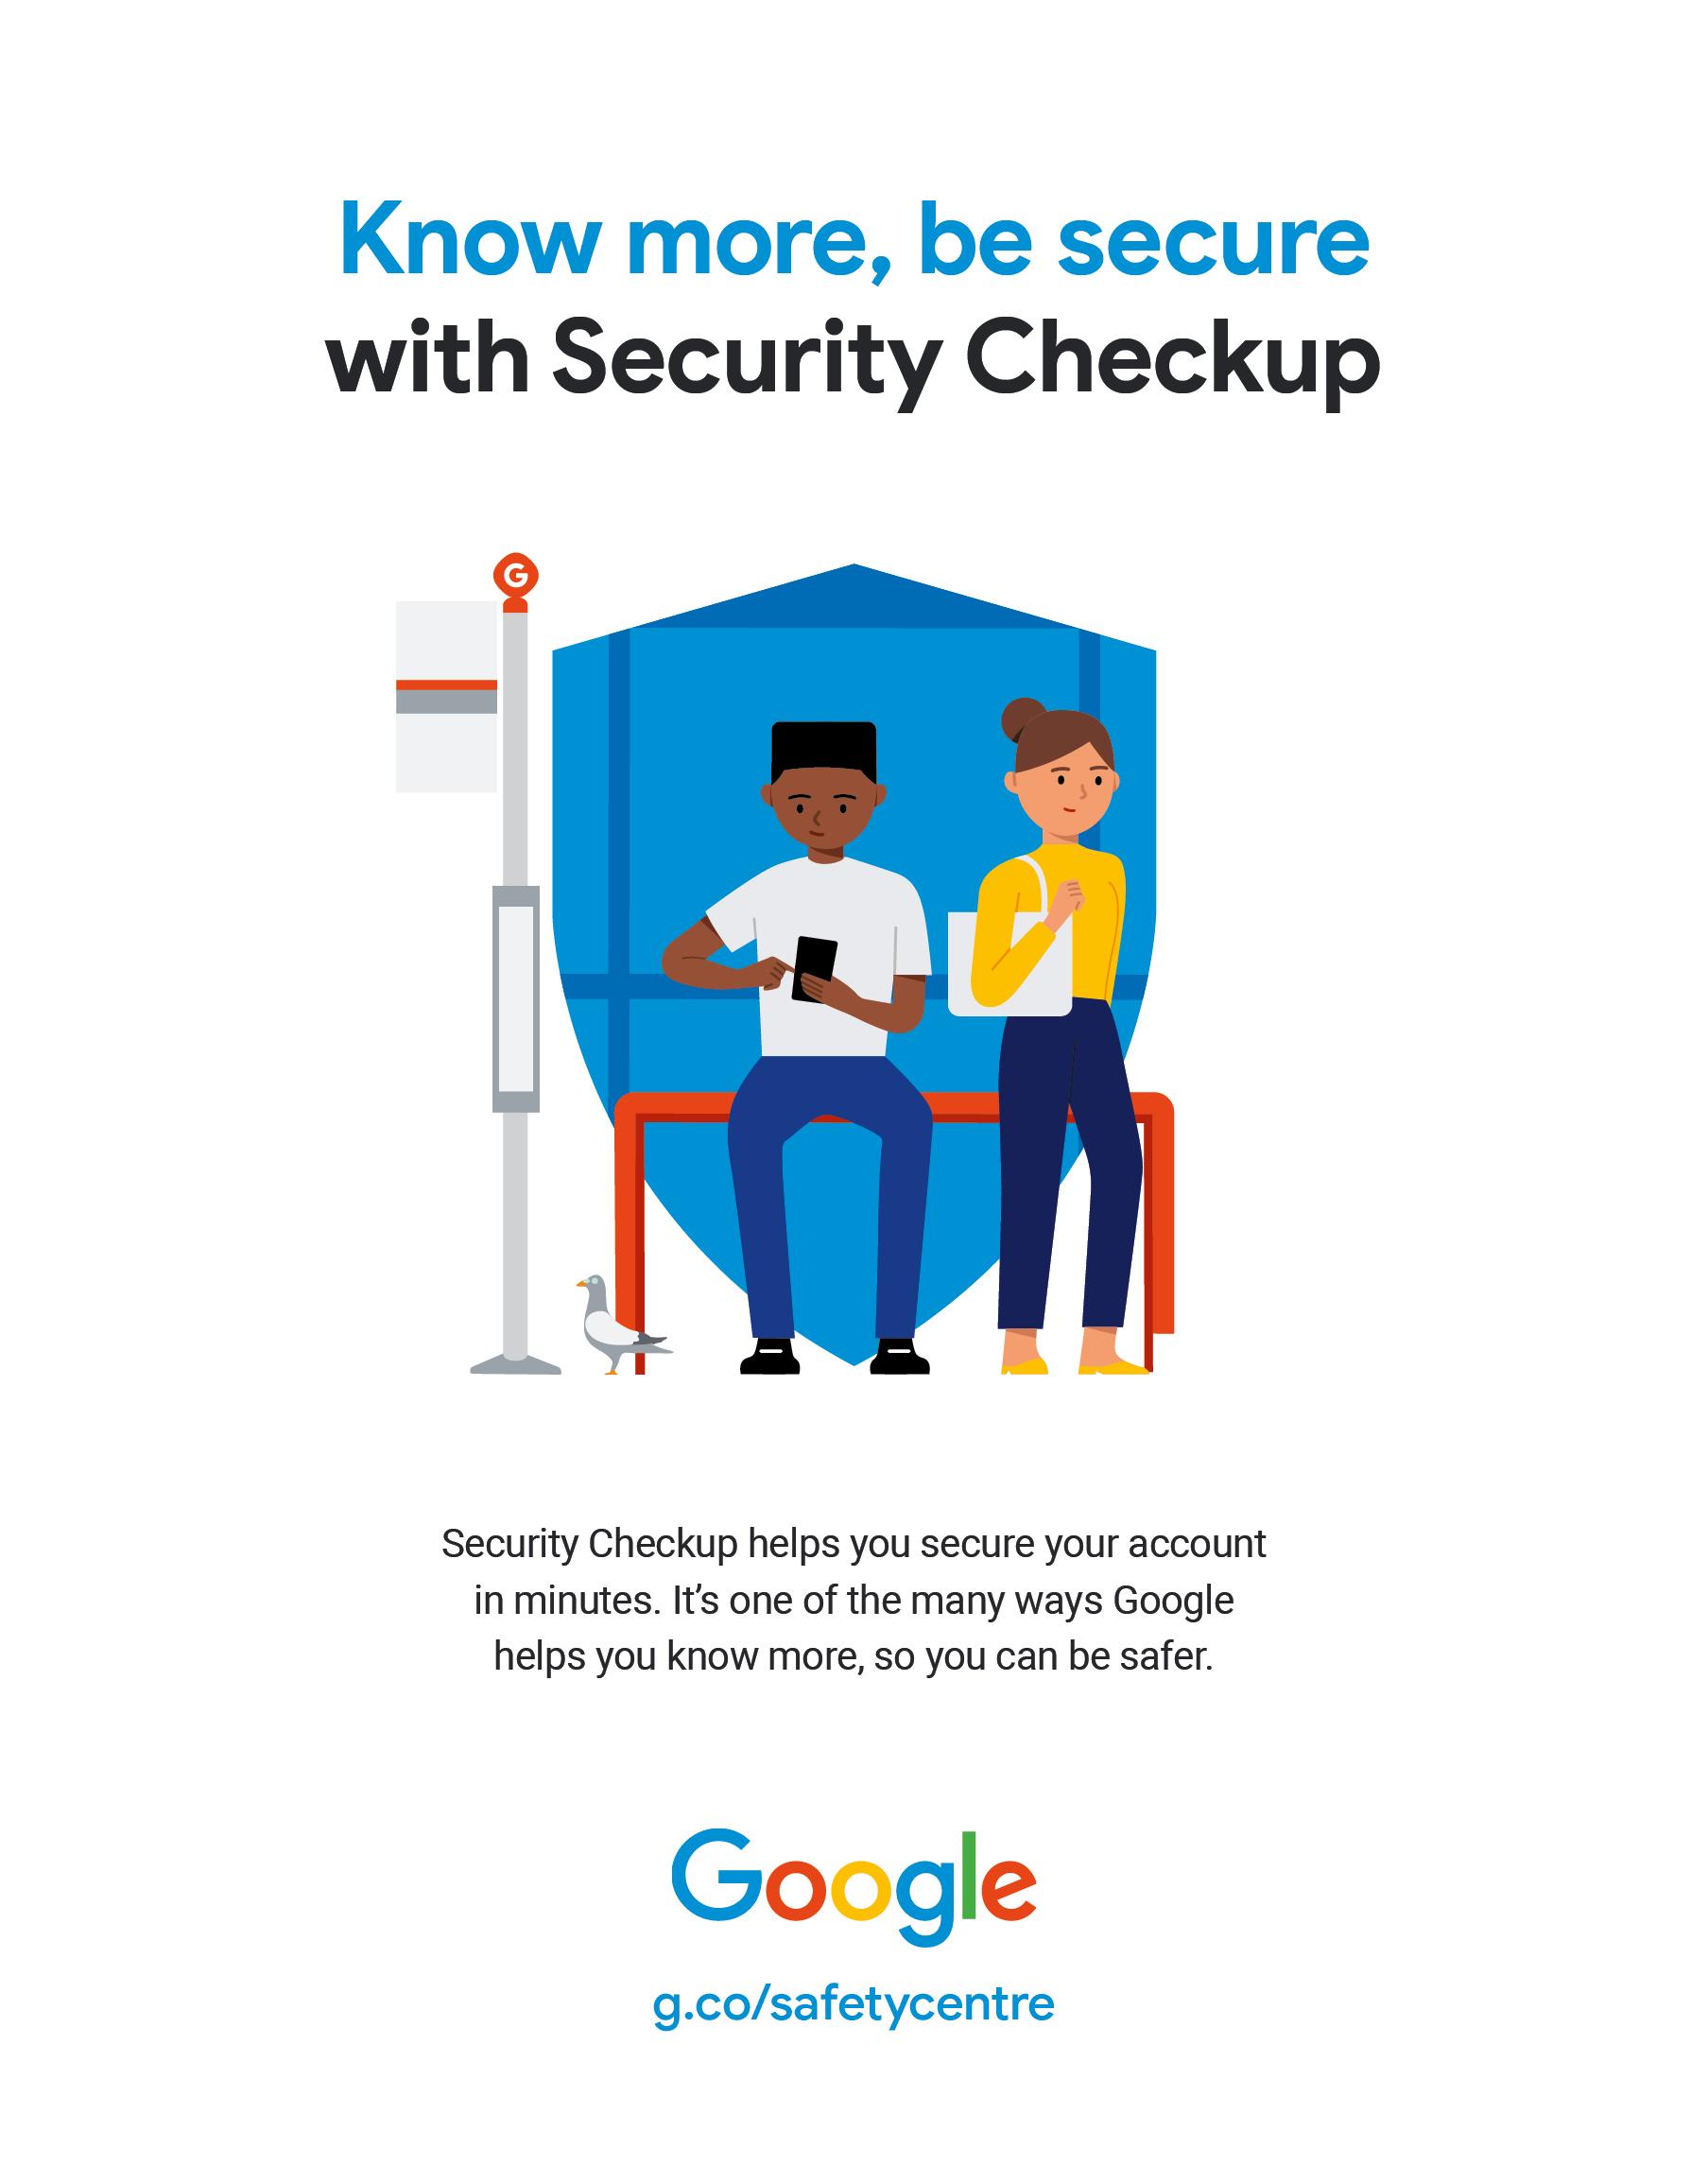 West_P14_GoogleOS_Security_153x194.jpg